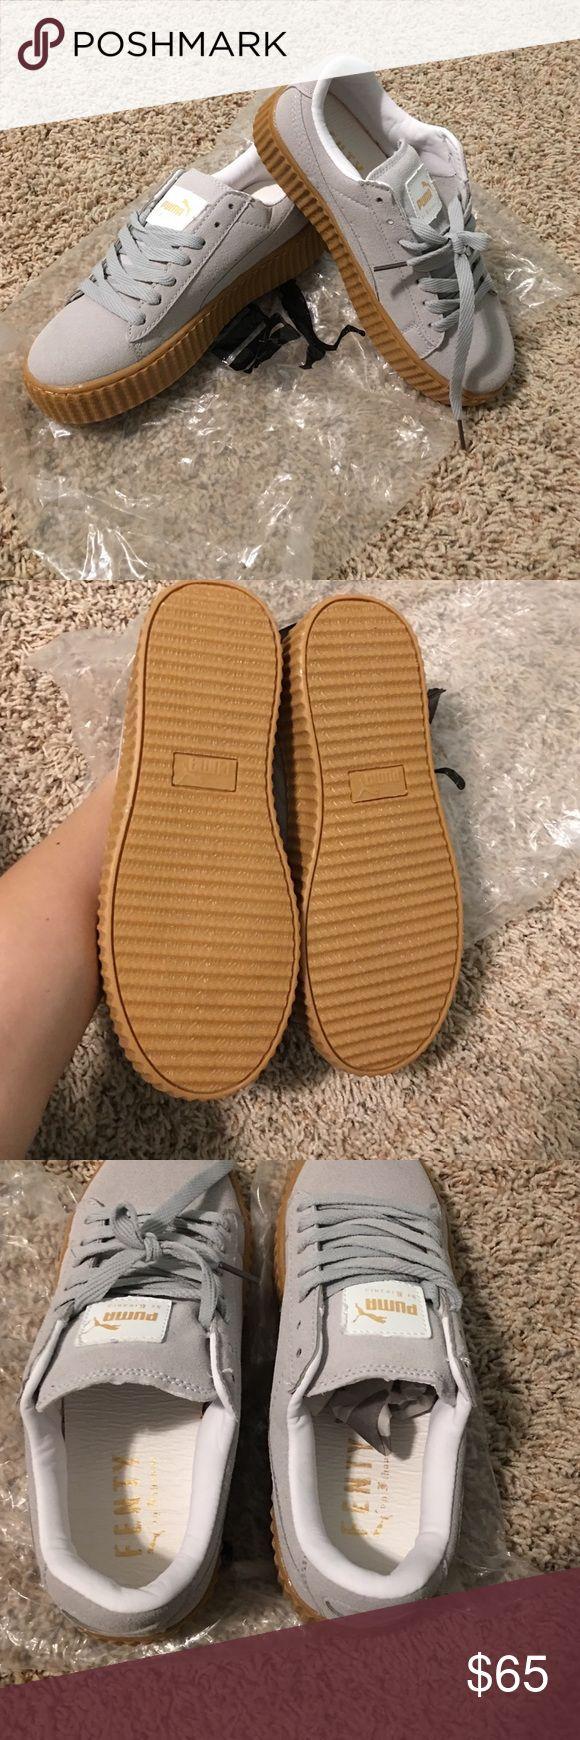 8b86a921c8f puma shoes rihanna orange cheap   OFF46% Discounted